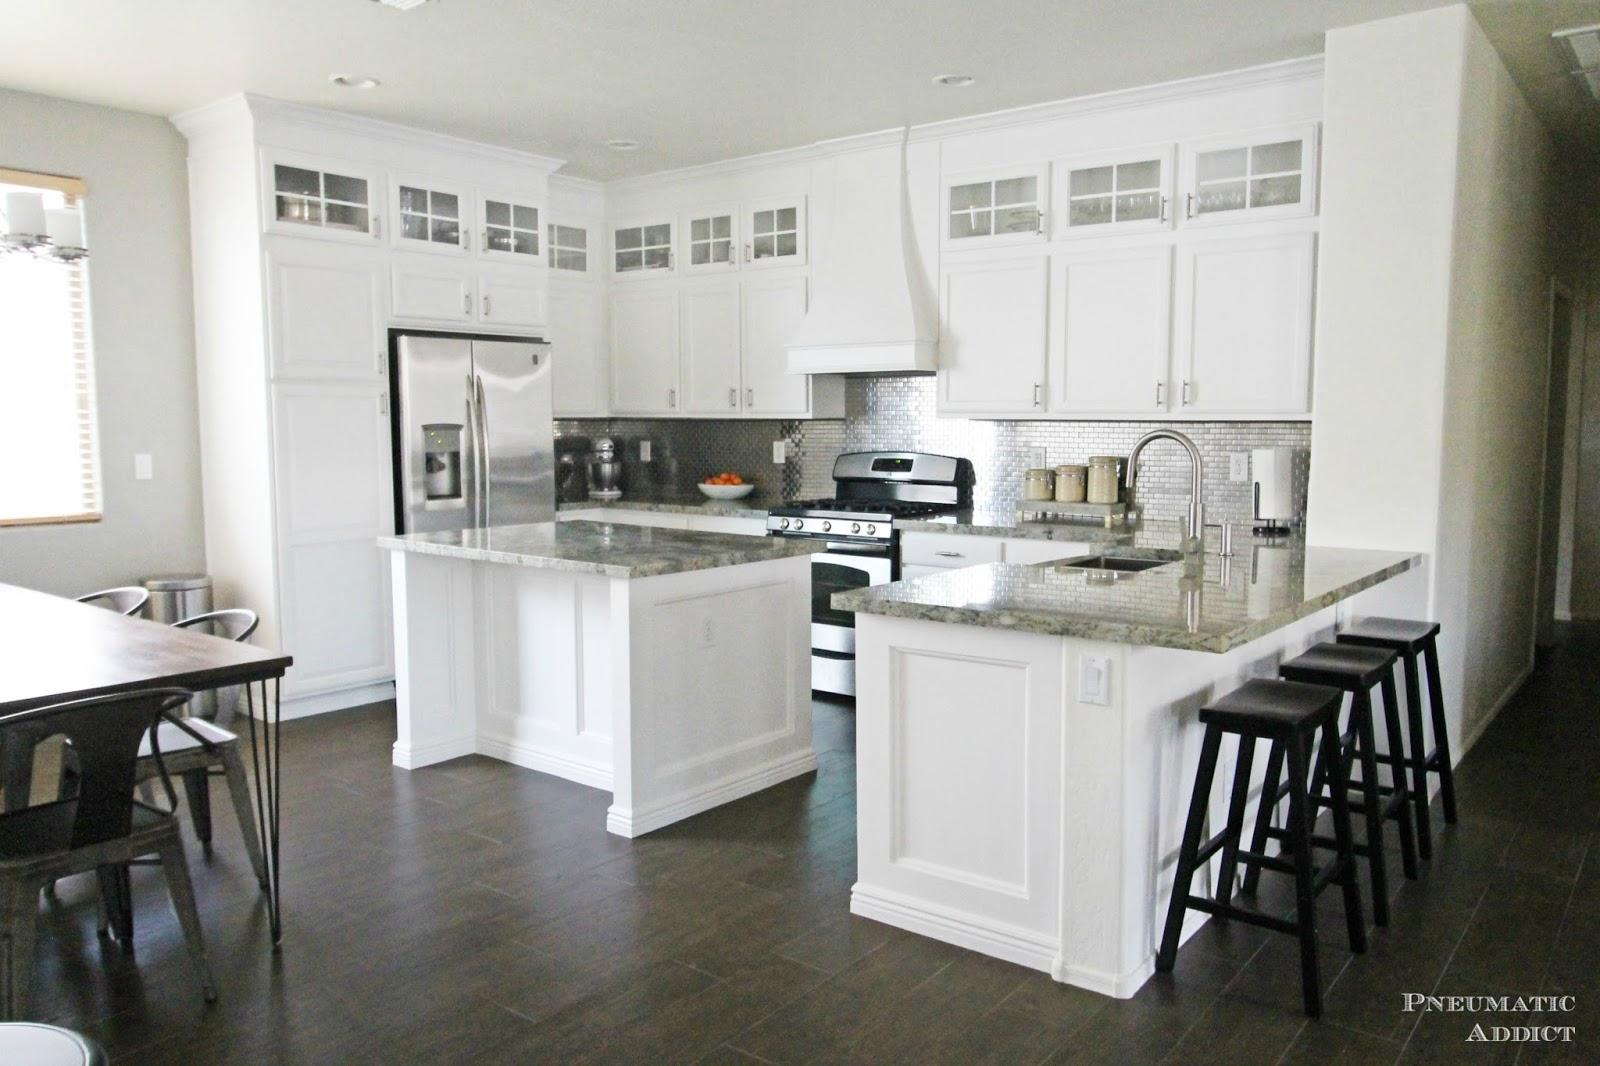 Kitchen-Makeove-Hopsack-and-Mindful-Grey-700x1056 Kitchen Cabinets Makeover